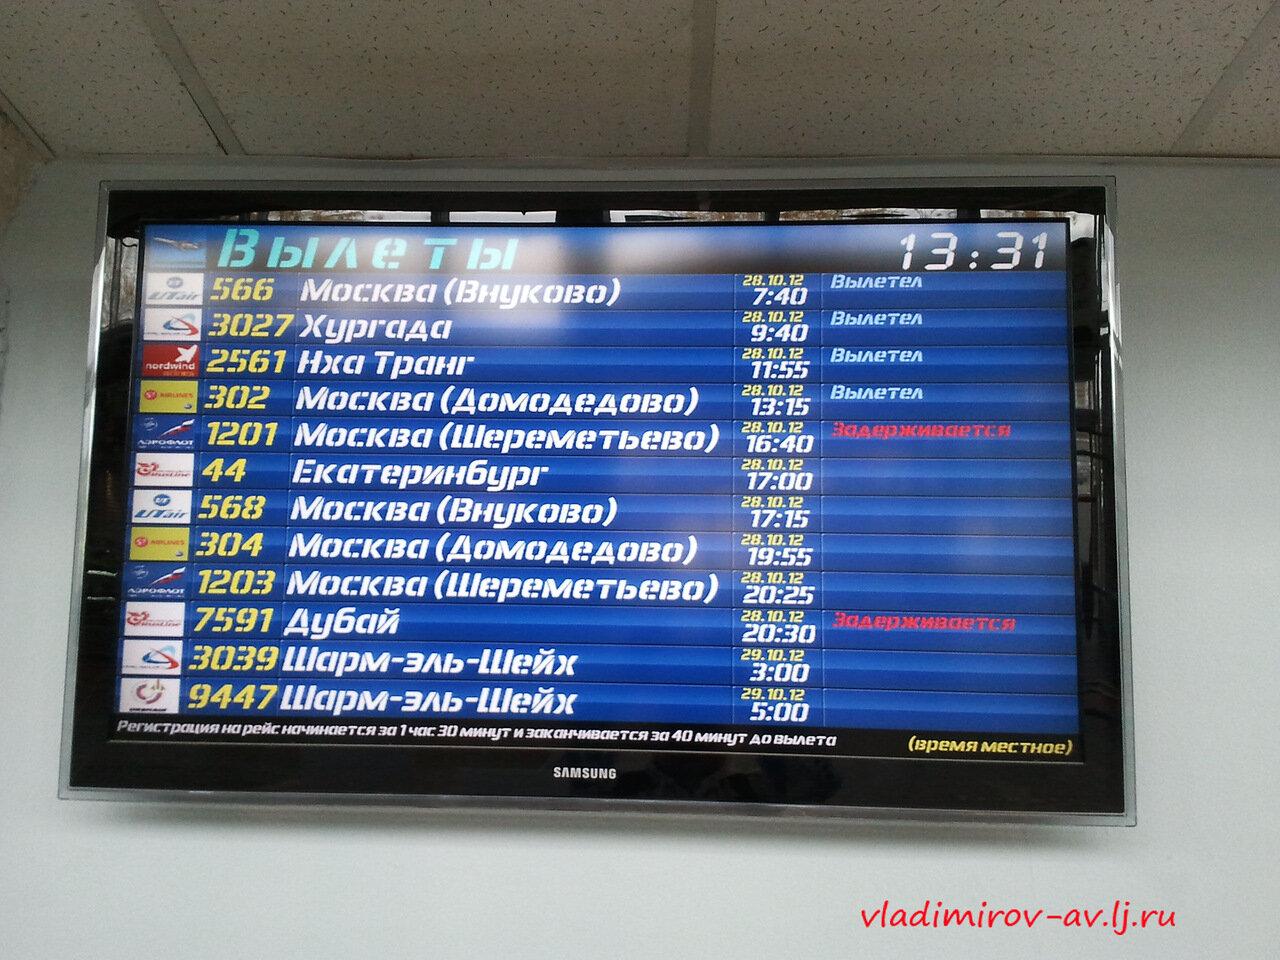 Москва Краснодар авиабилеты цена на прямые рейсы